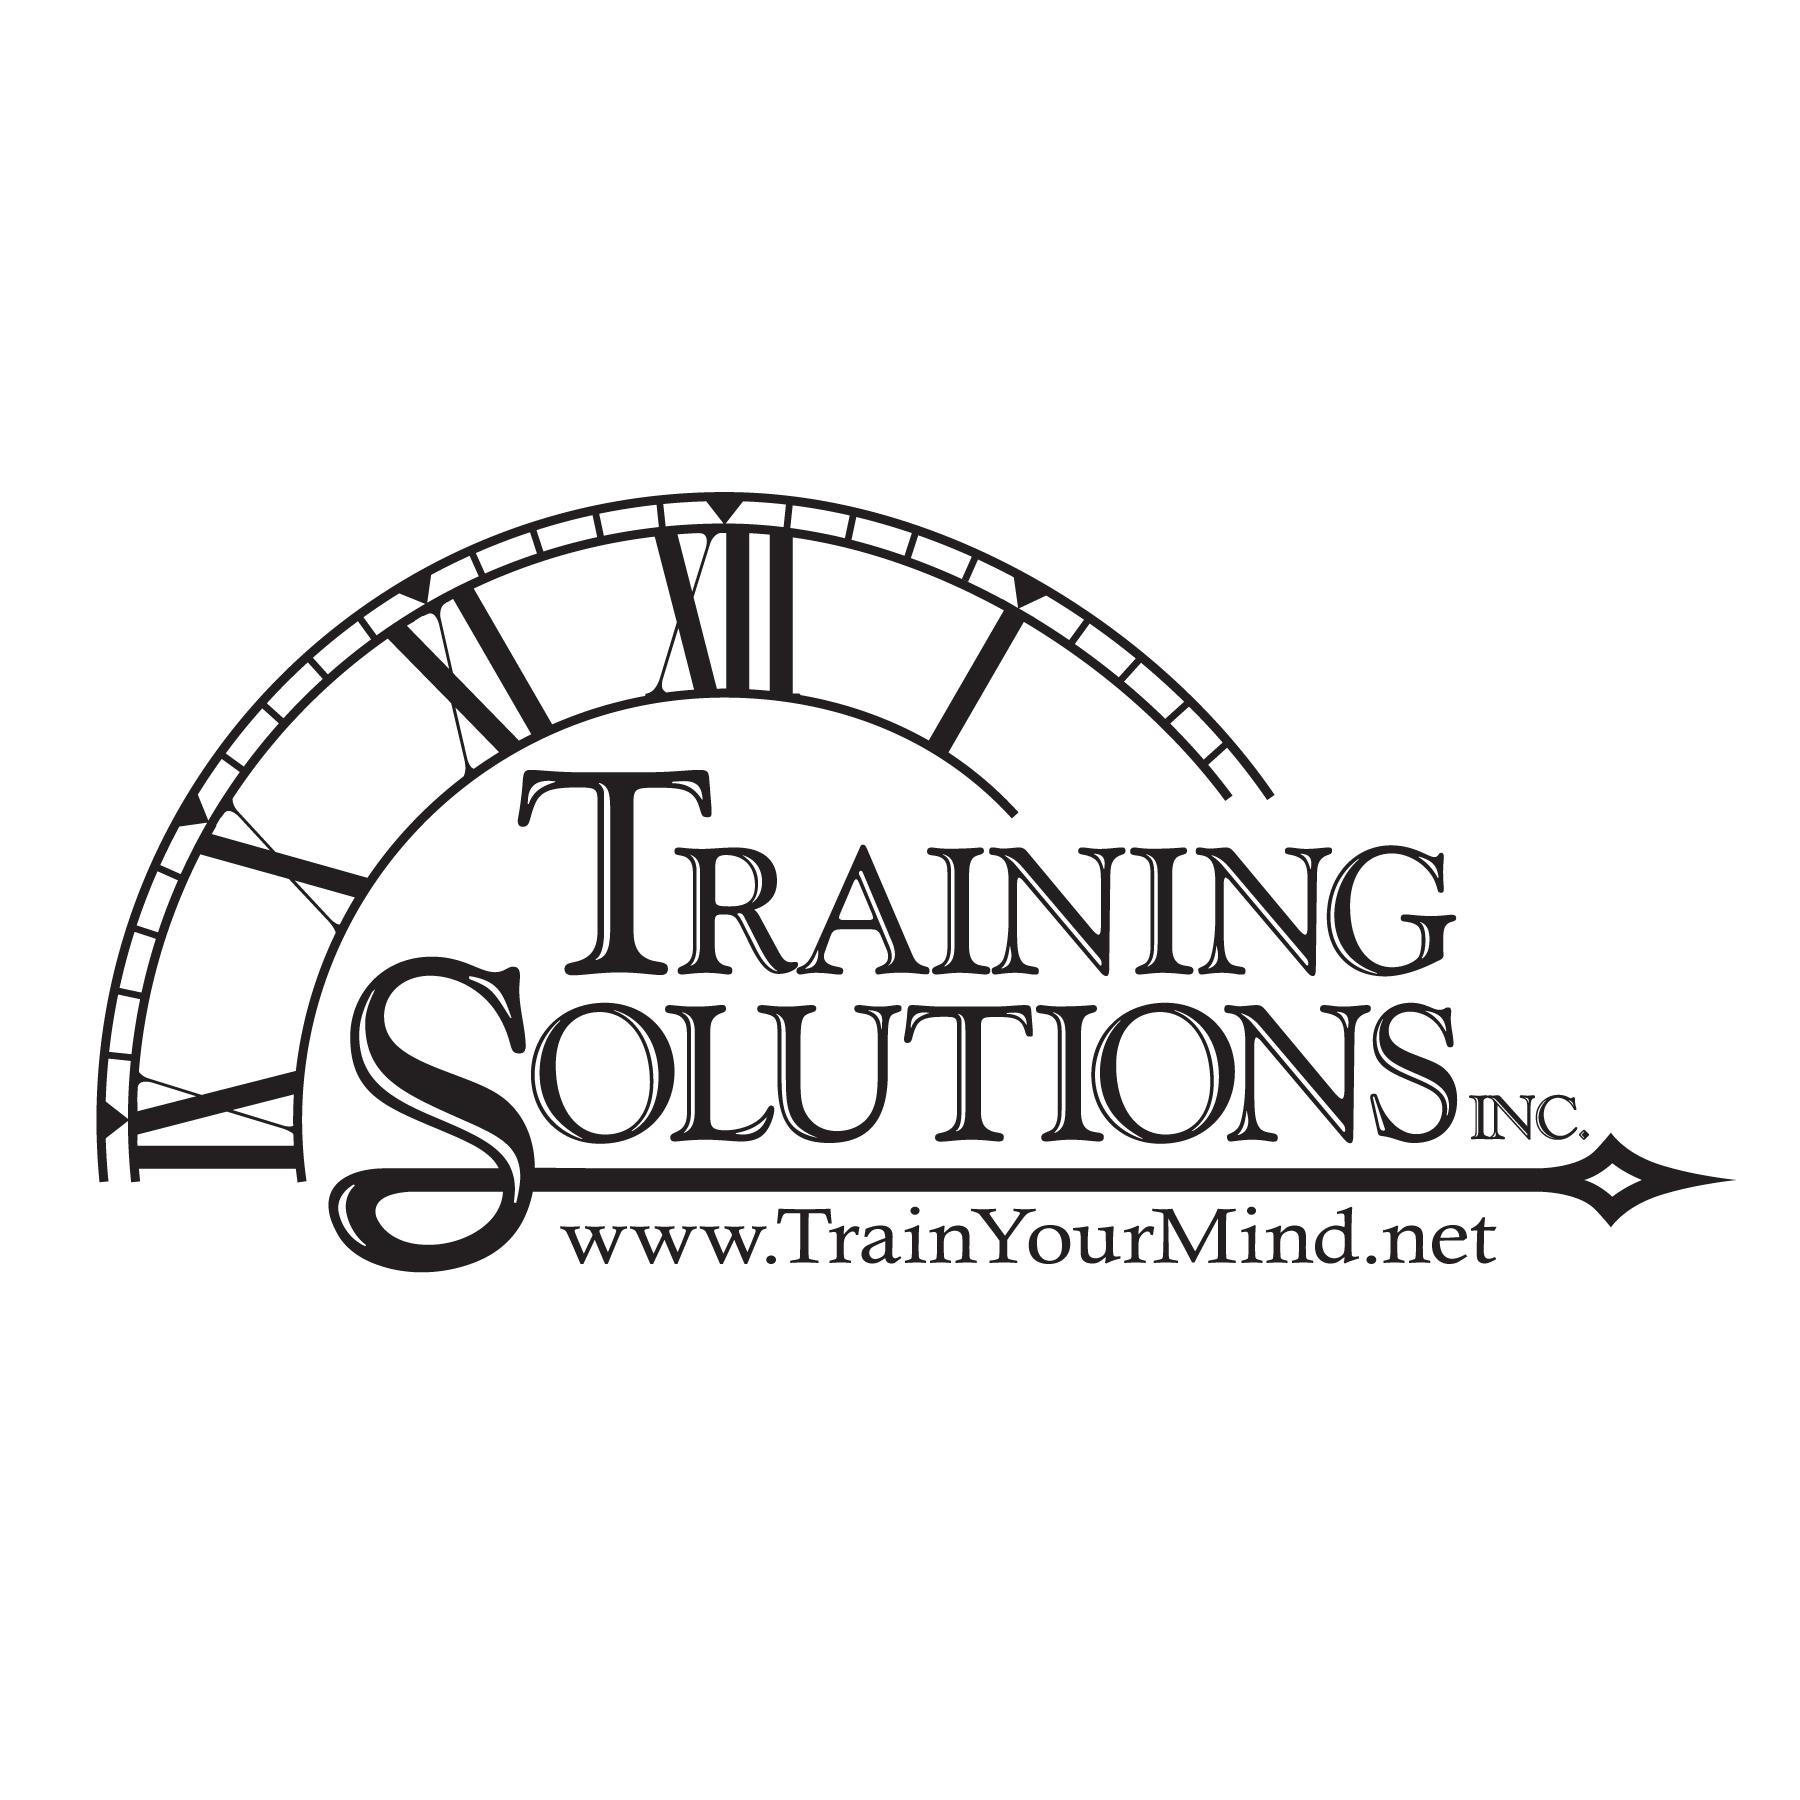 Training Solutions Inc